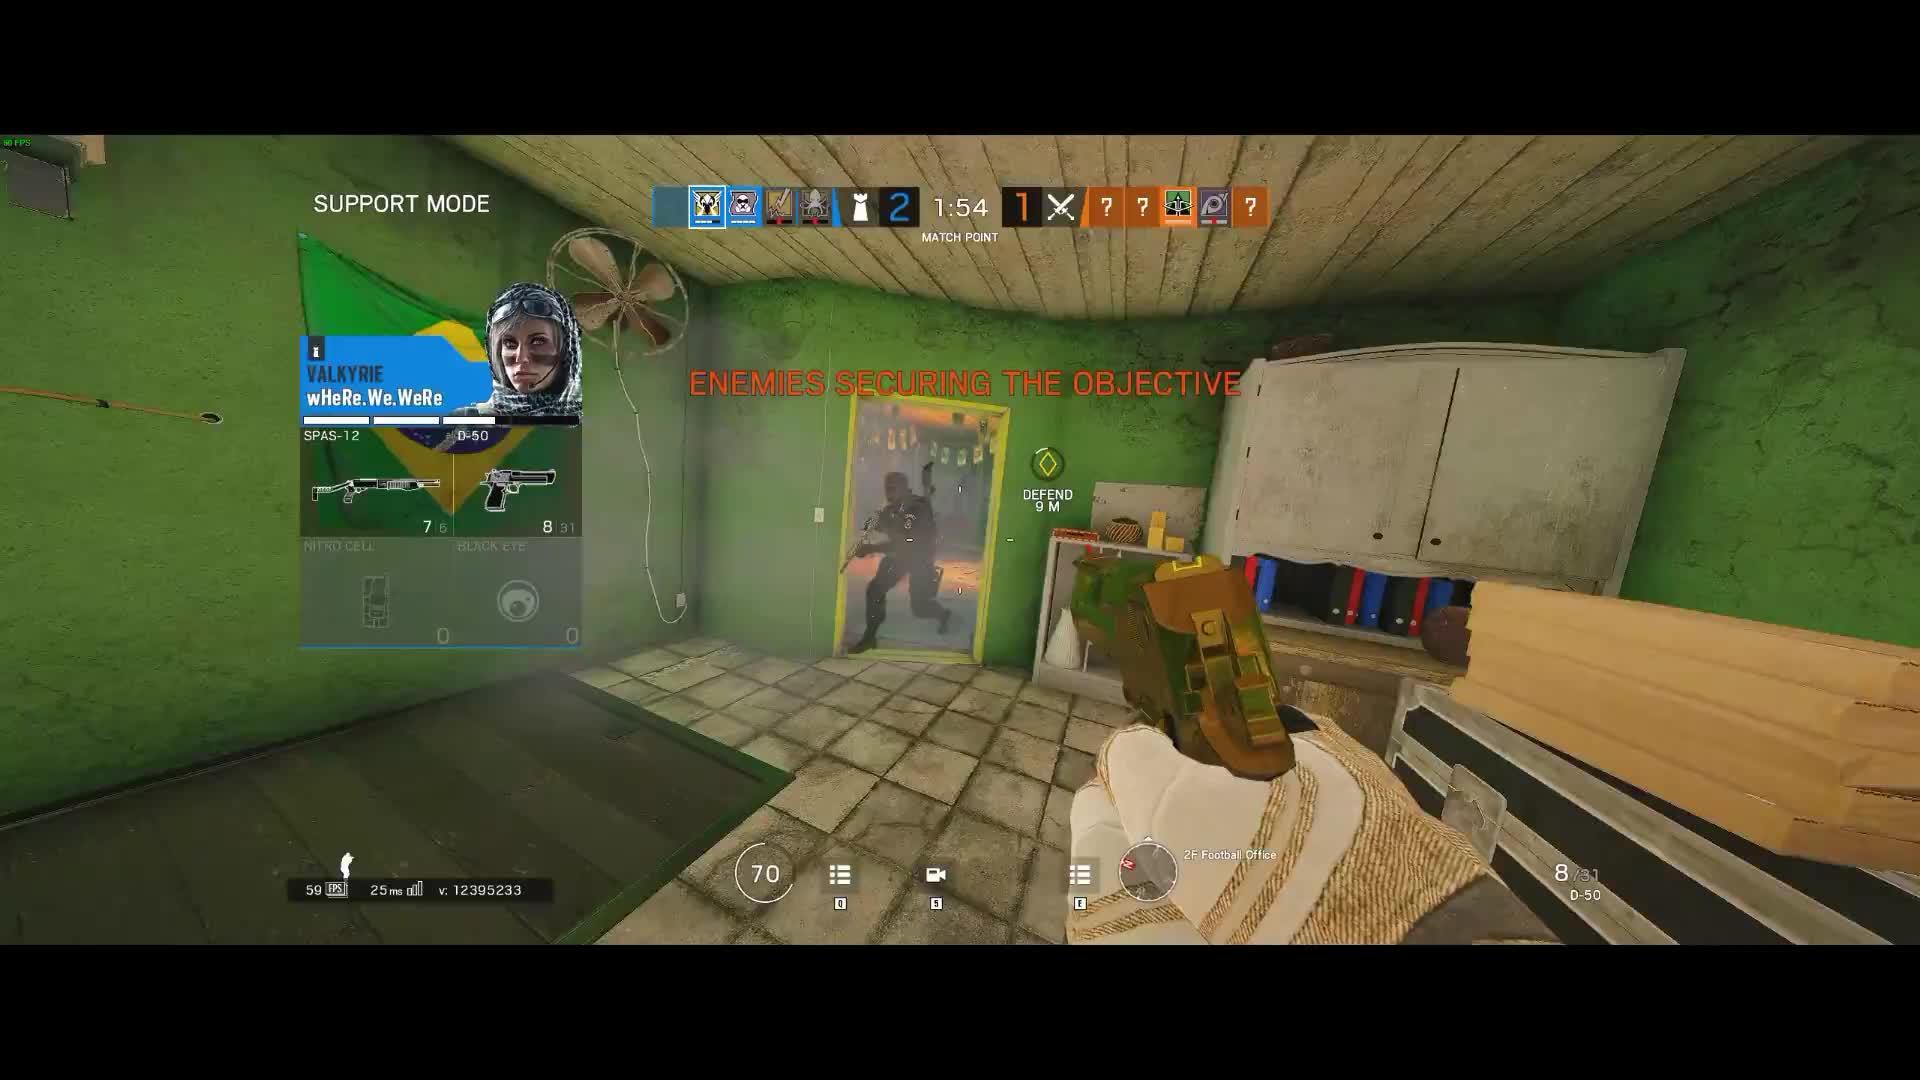 Favela - DClutch GIFs